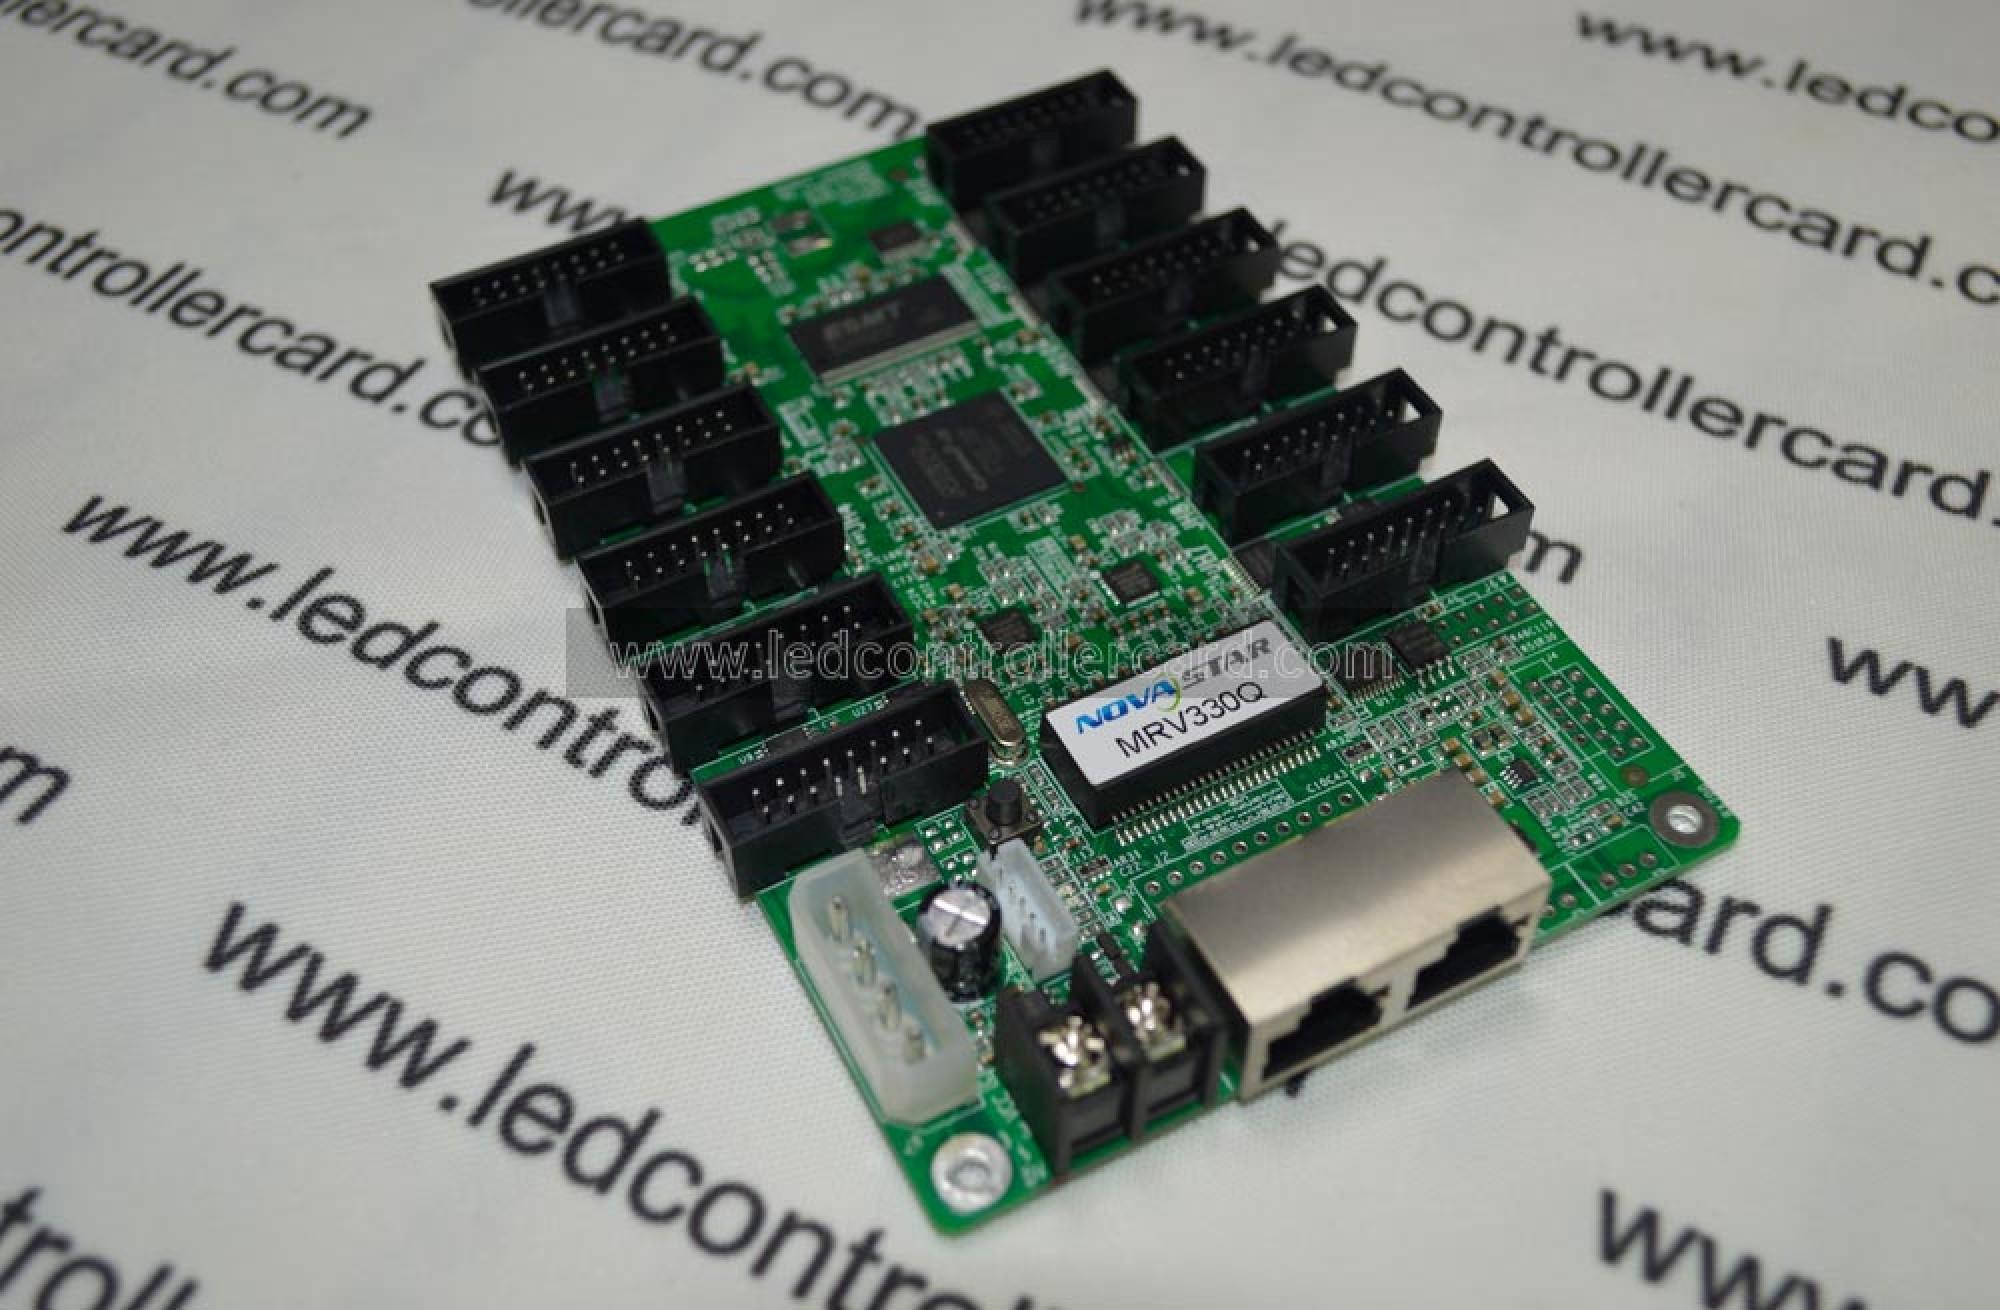 MRV330Q NOVASTAR LED Receiver Card Integrated with HUB75 Output